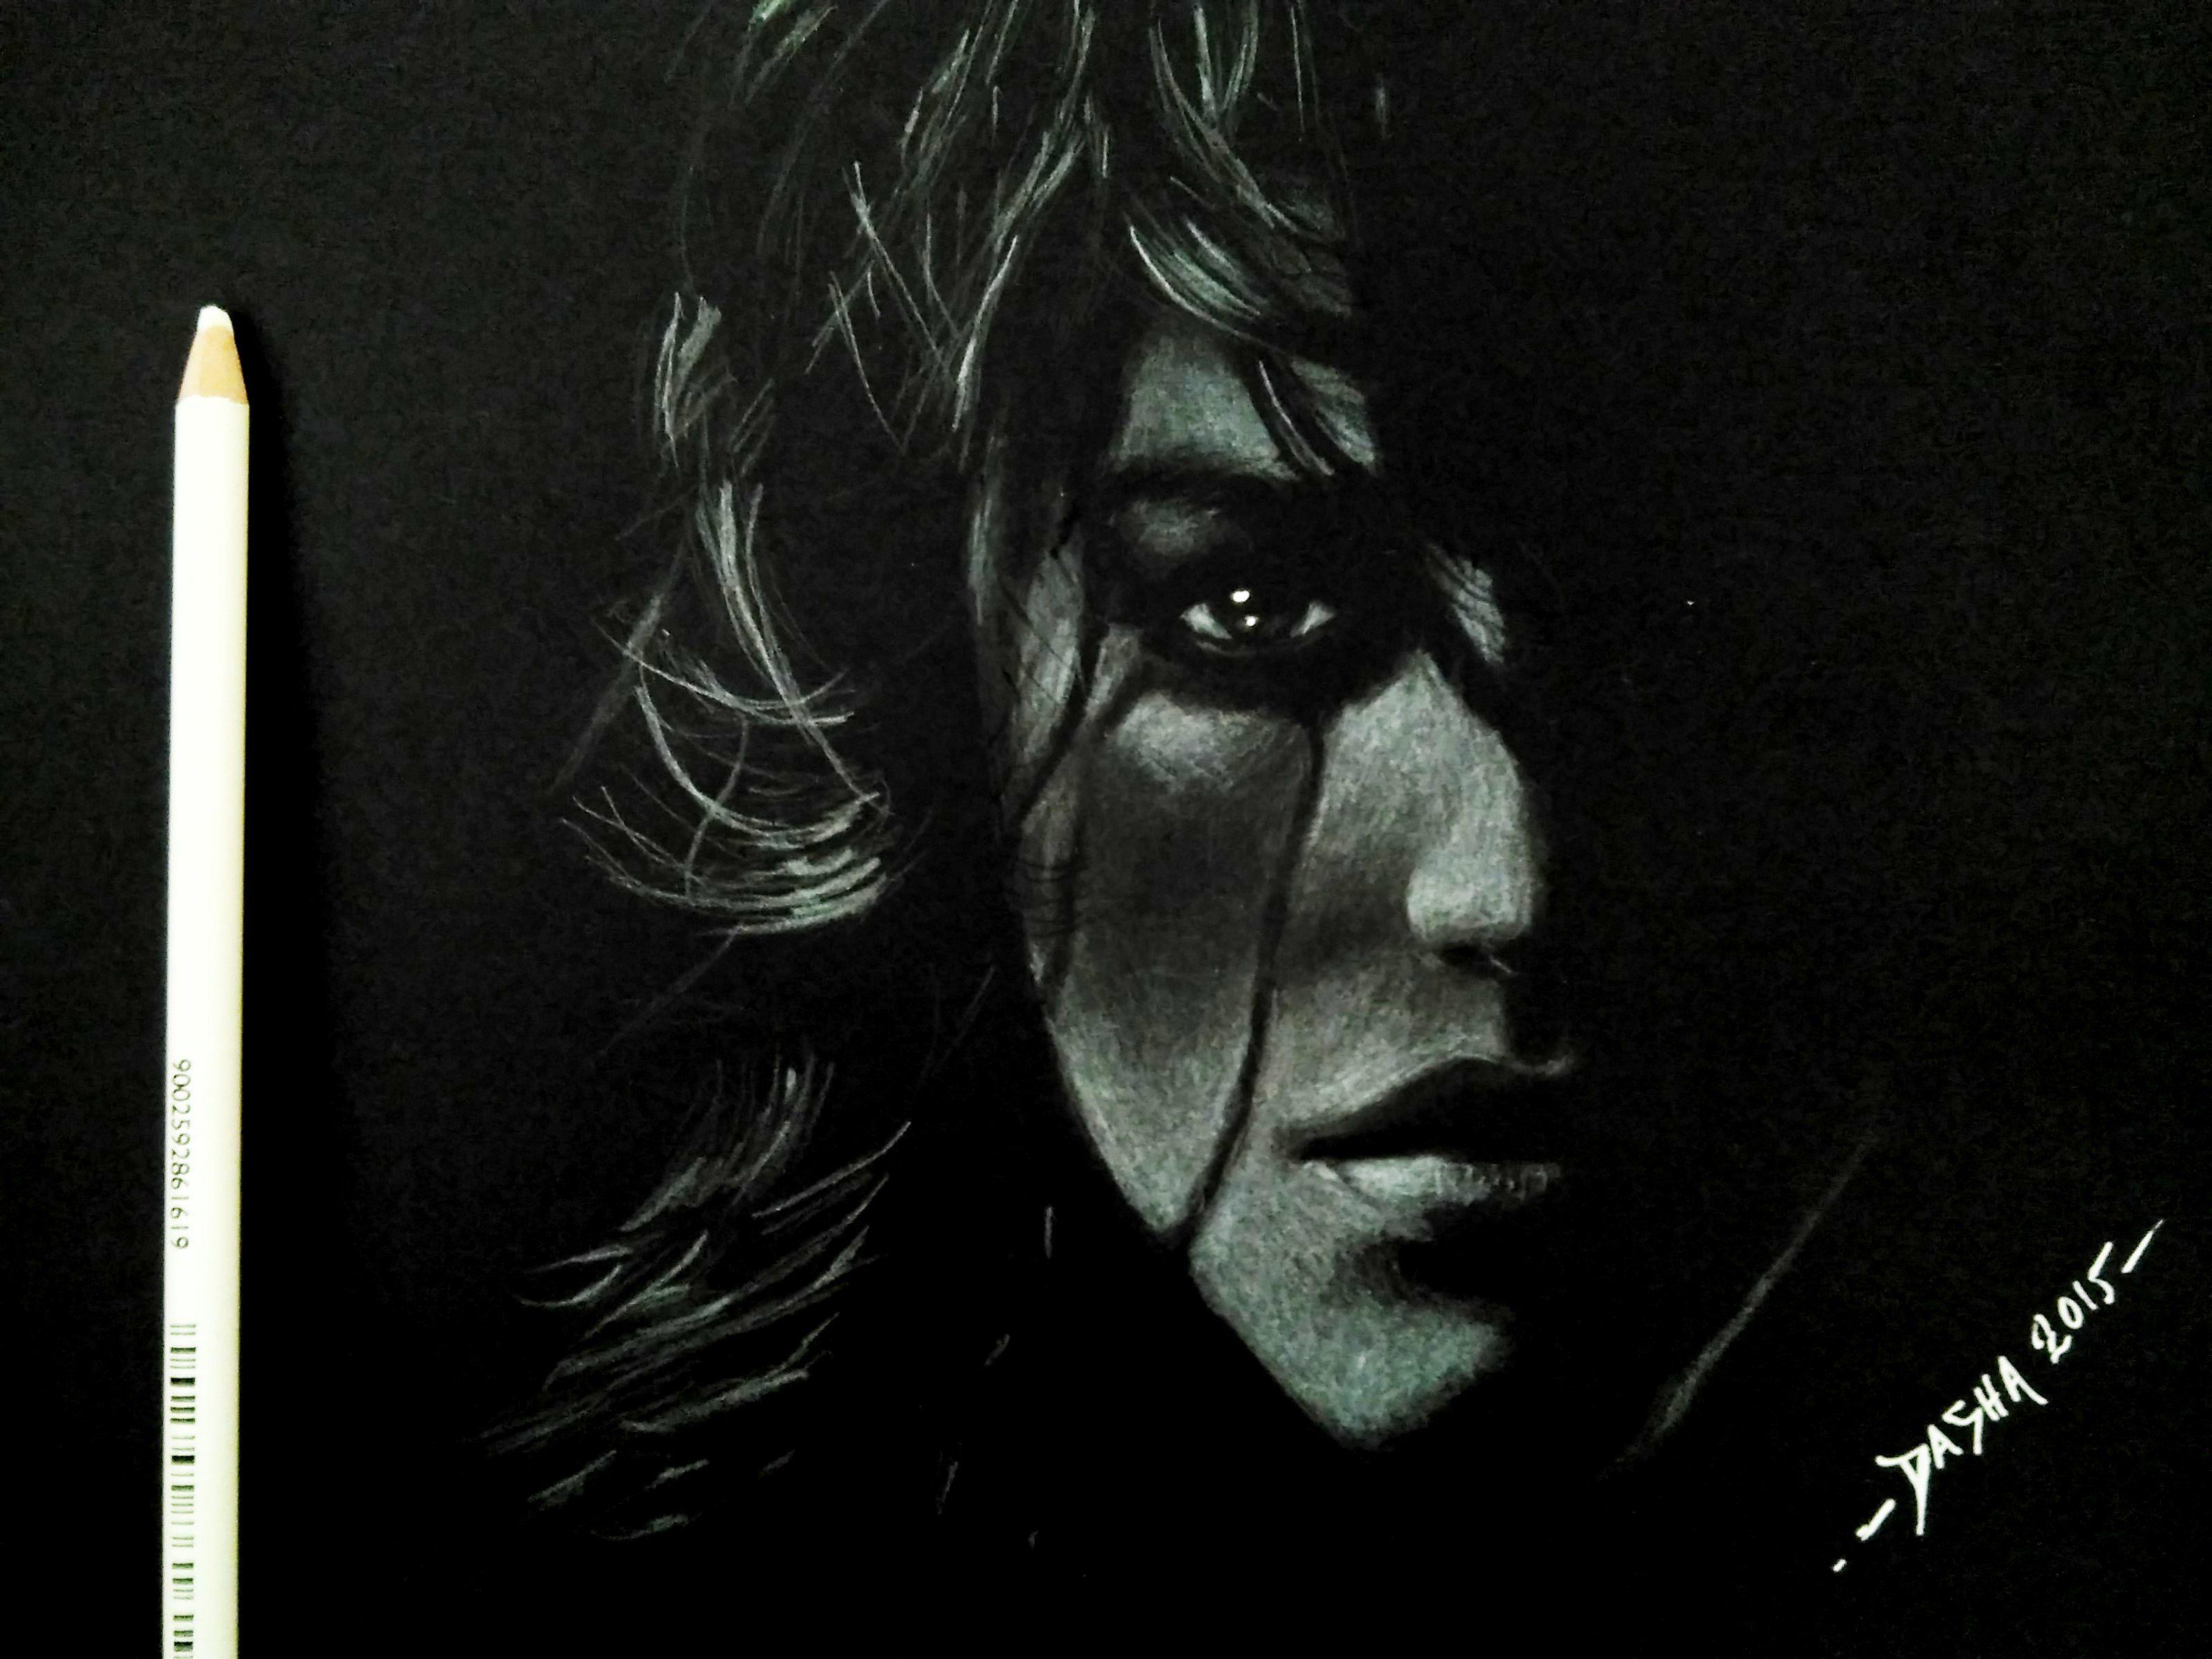 White pencil charcoal on black paper portrait girl face